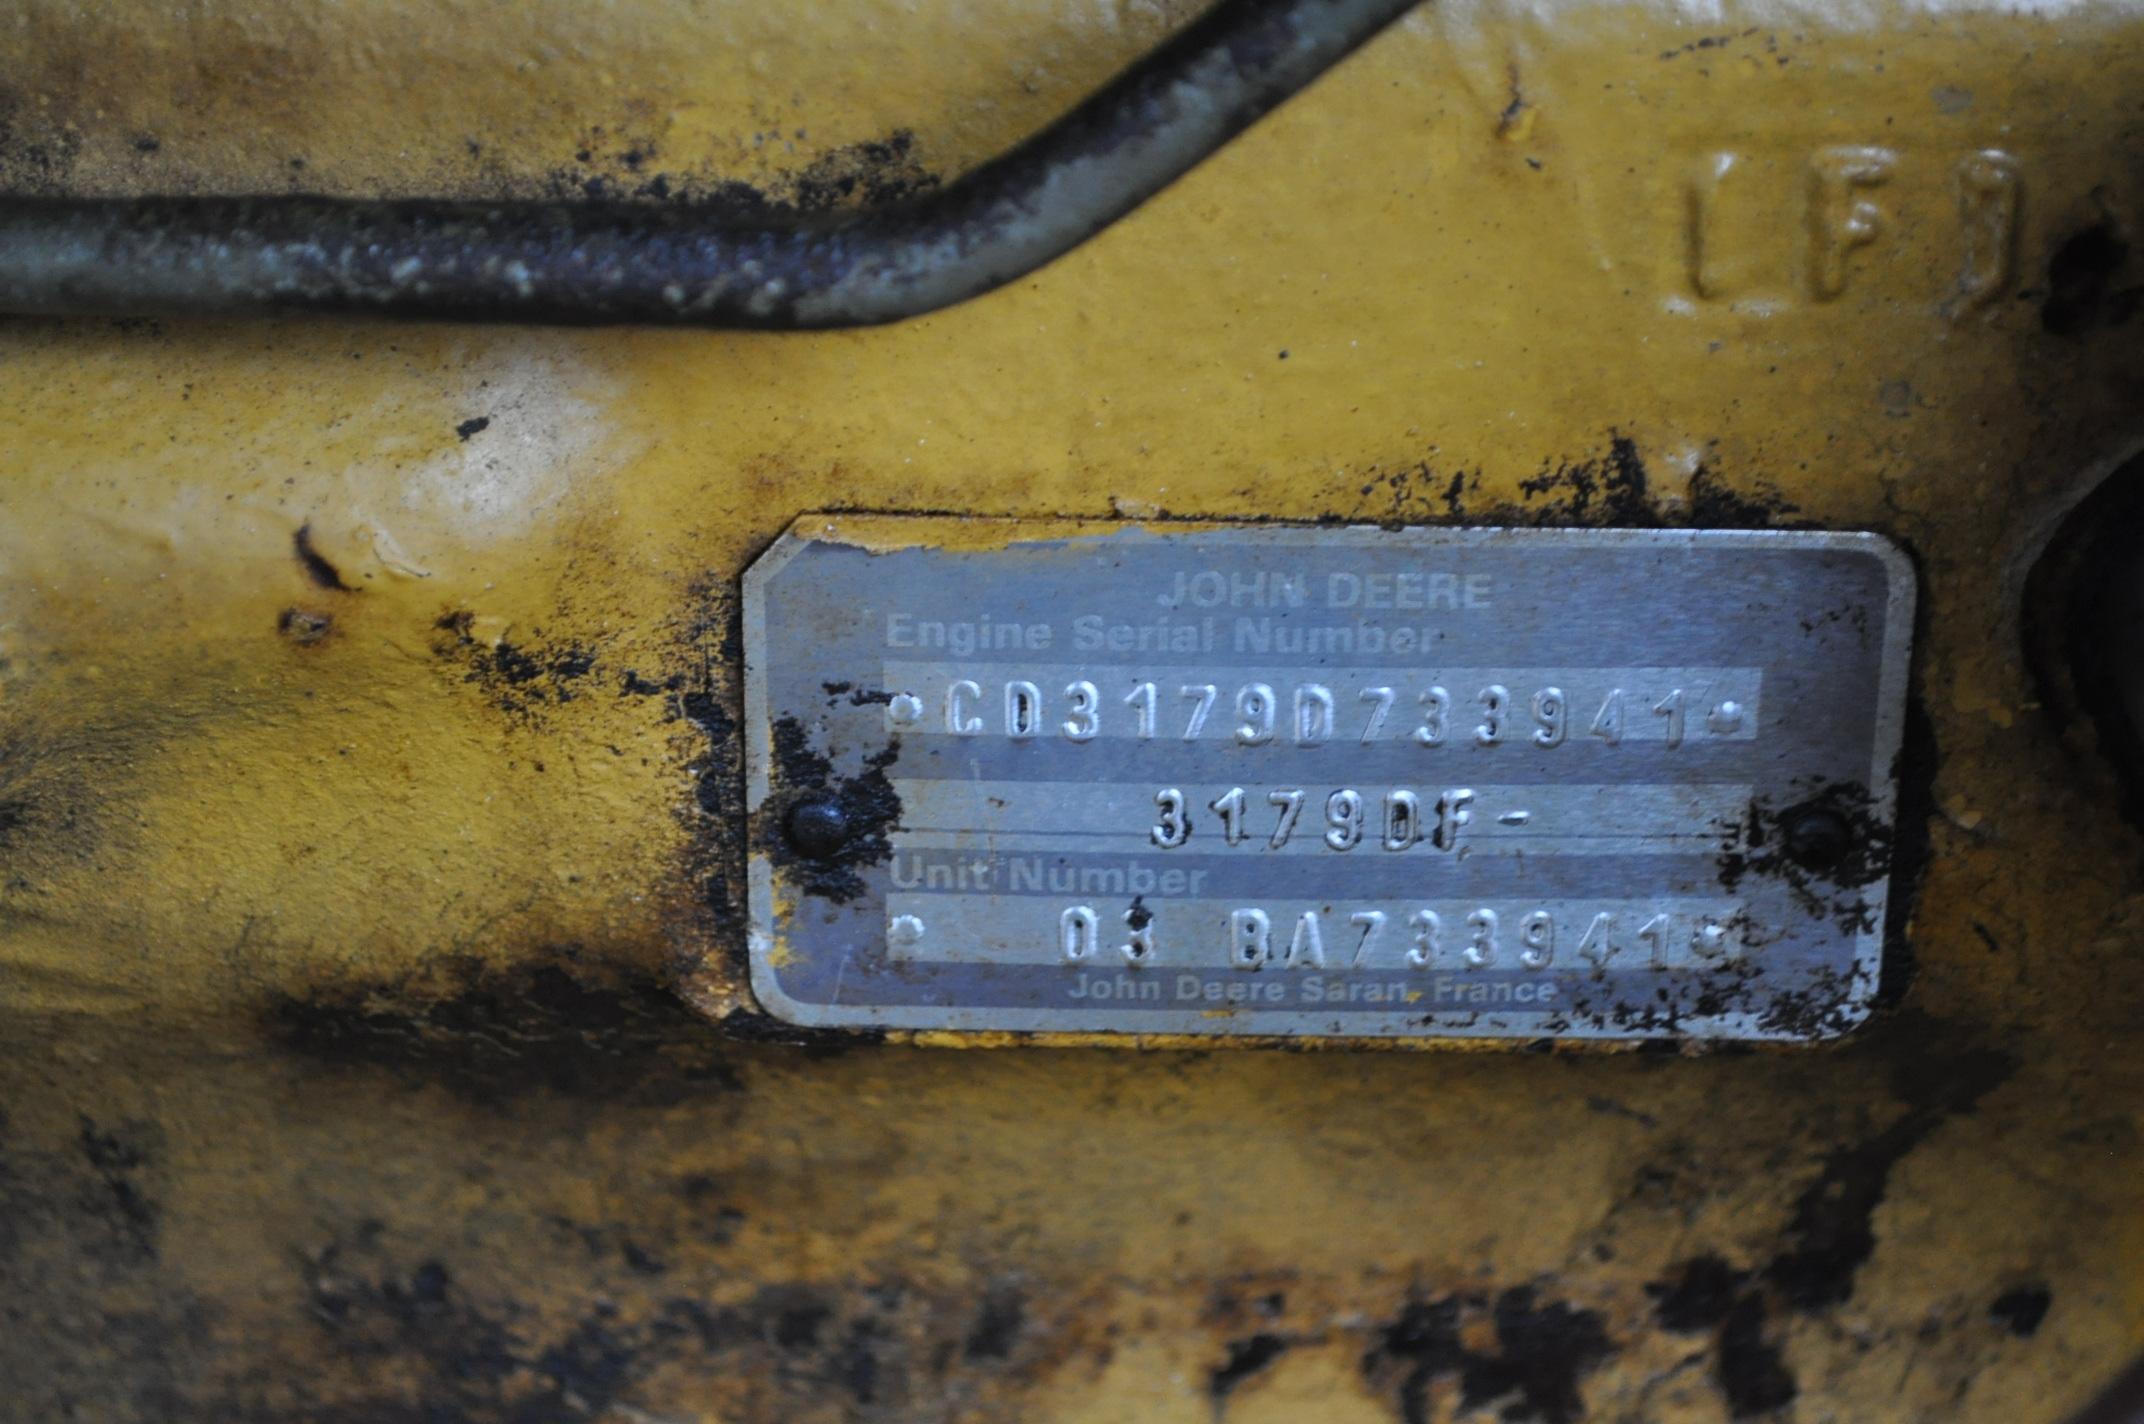 Vermeer V450 Trencher, parts machine, backhoe attachment, JD diesel, SN 1VRF082L2H1000460 - Image 12 of 15